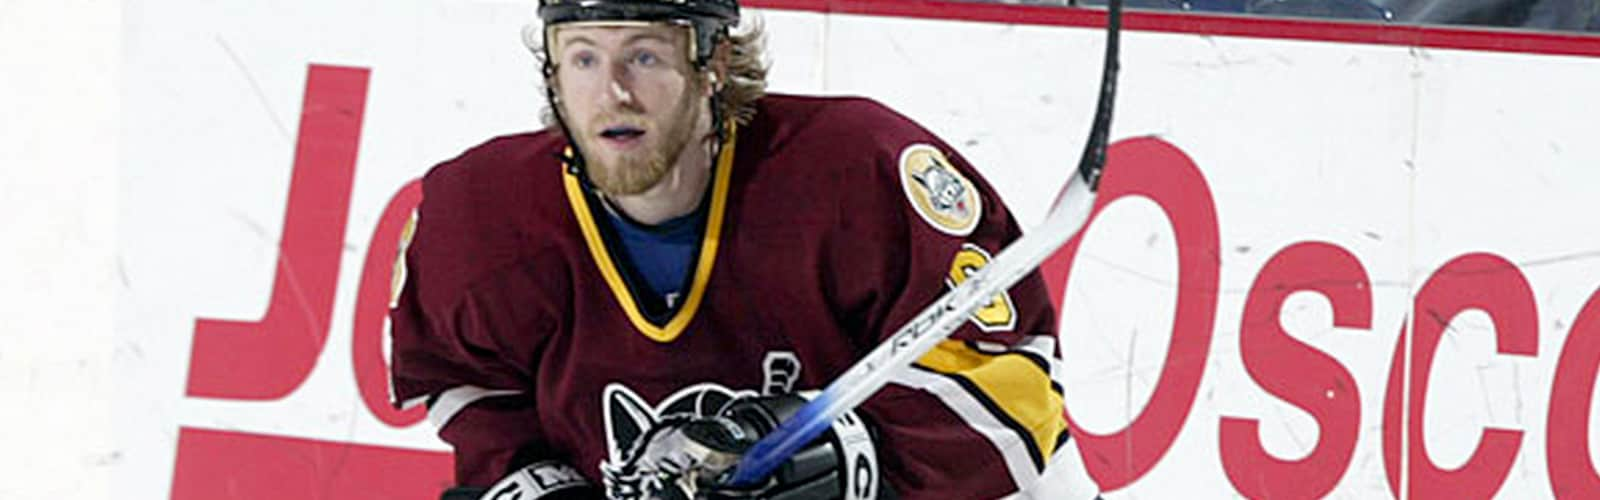 chicago hockey allstars